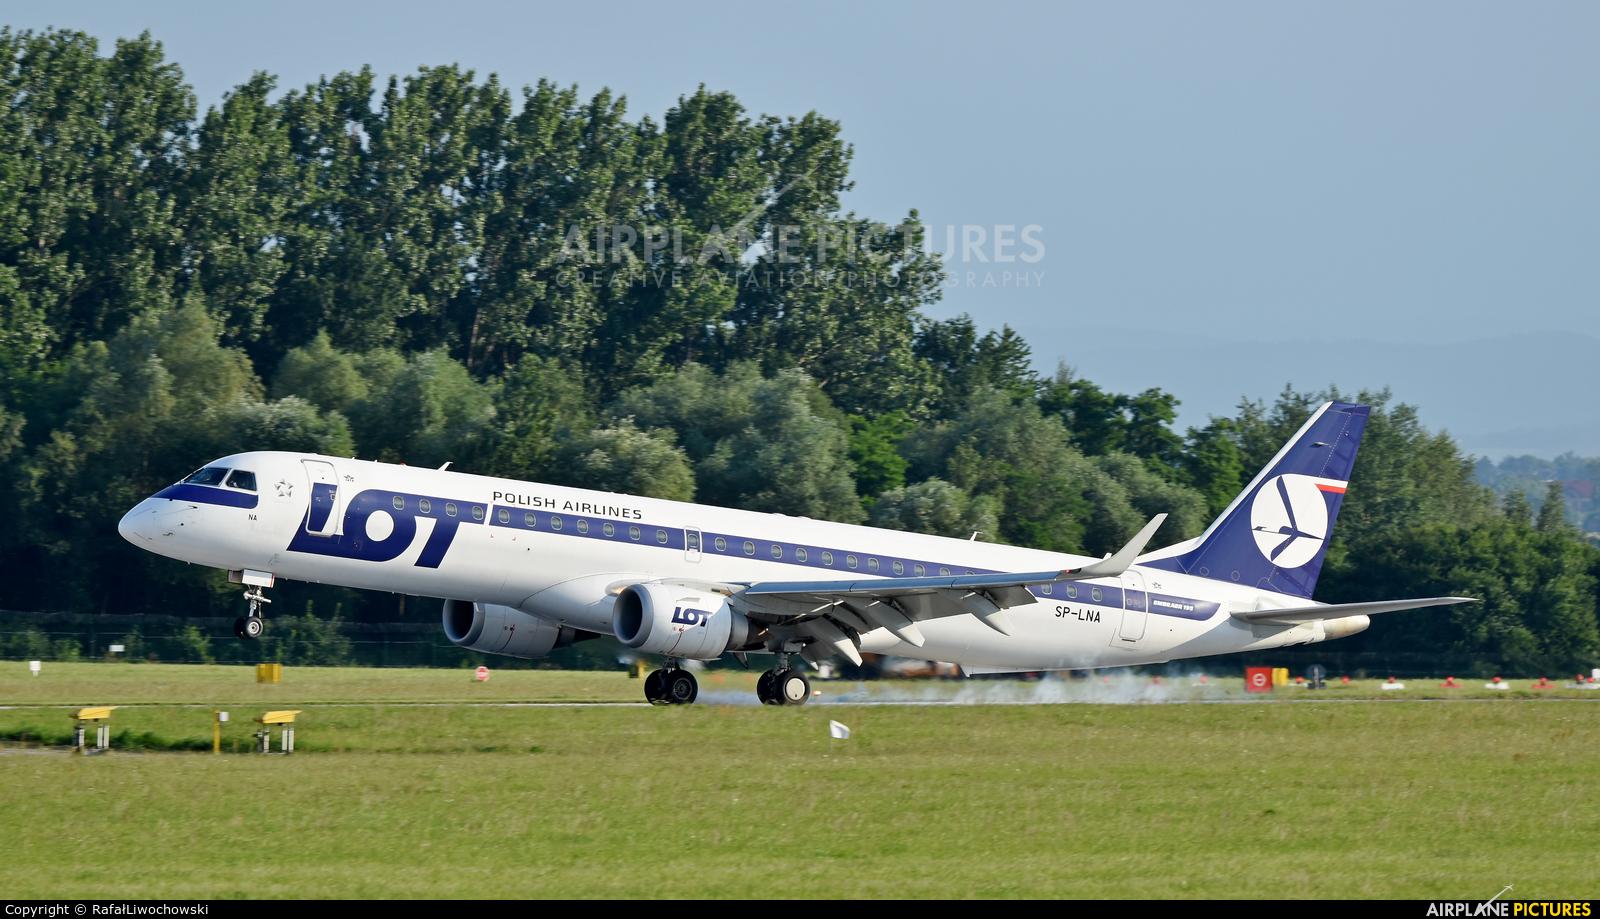 LOT - Polish Airlines SP-LNA aircraft at Kraków - John Paul II Intl